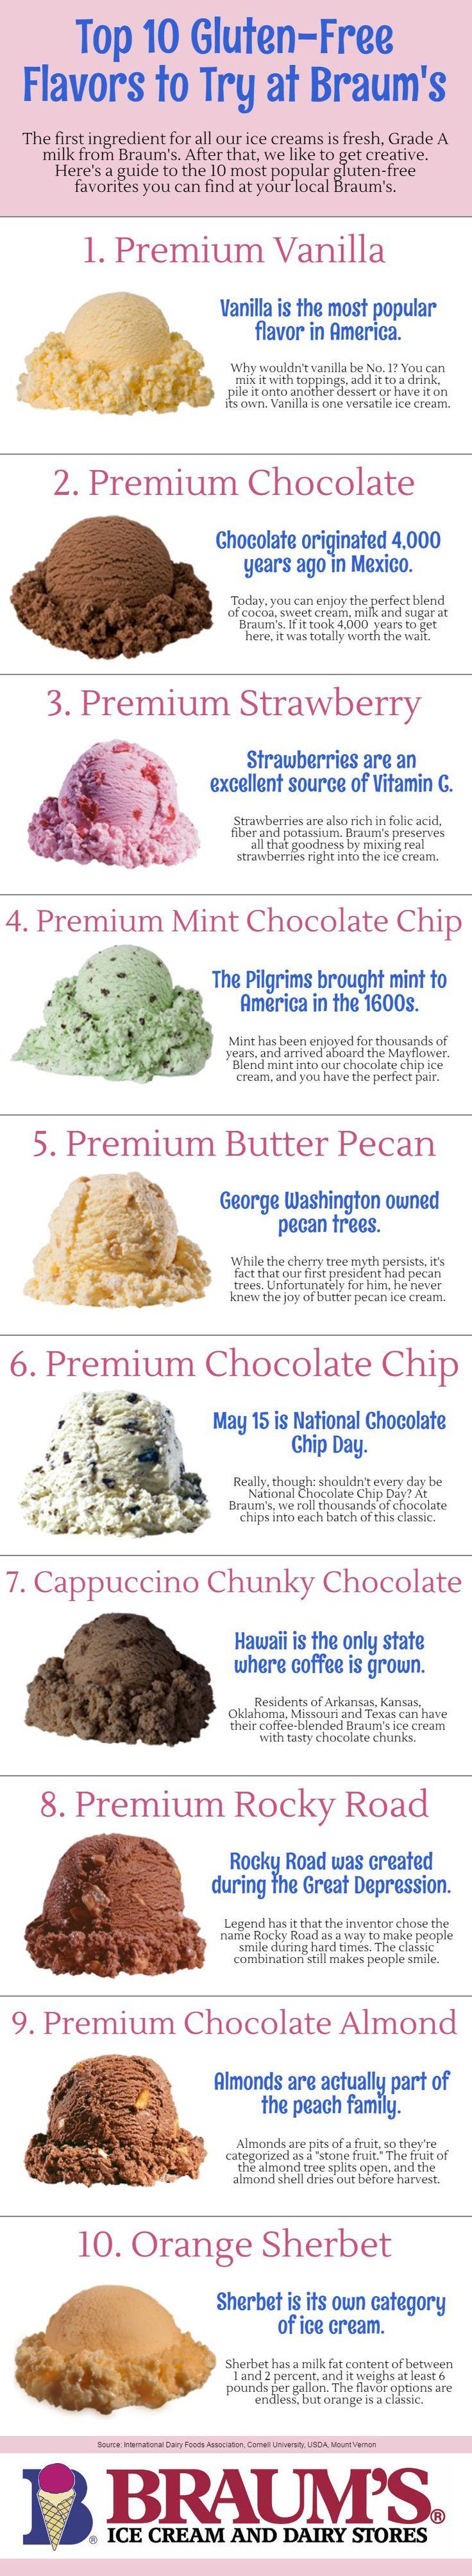 Braum's Top 10 Gluten-Free Ice Creams